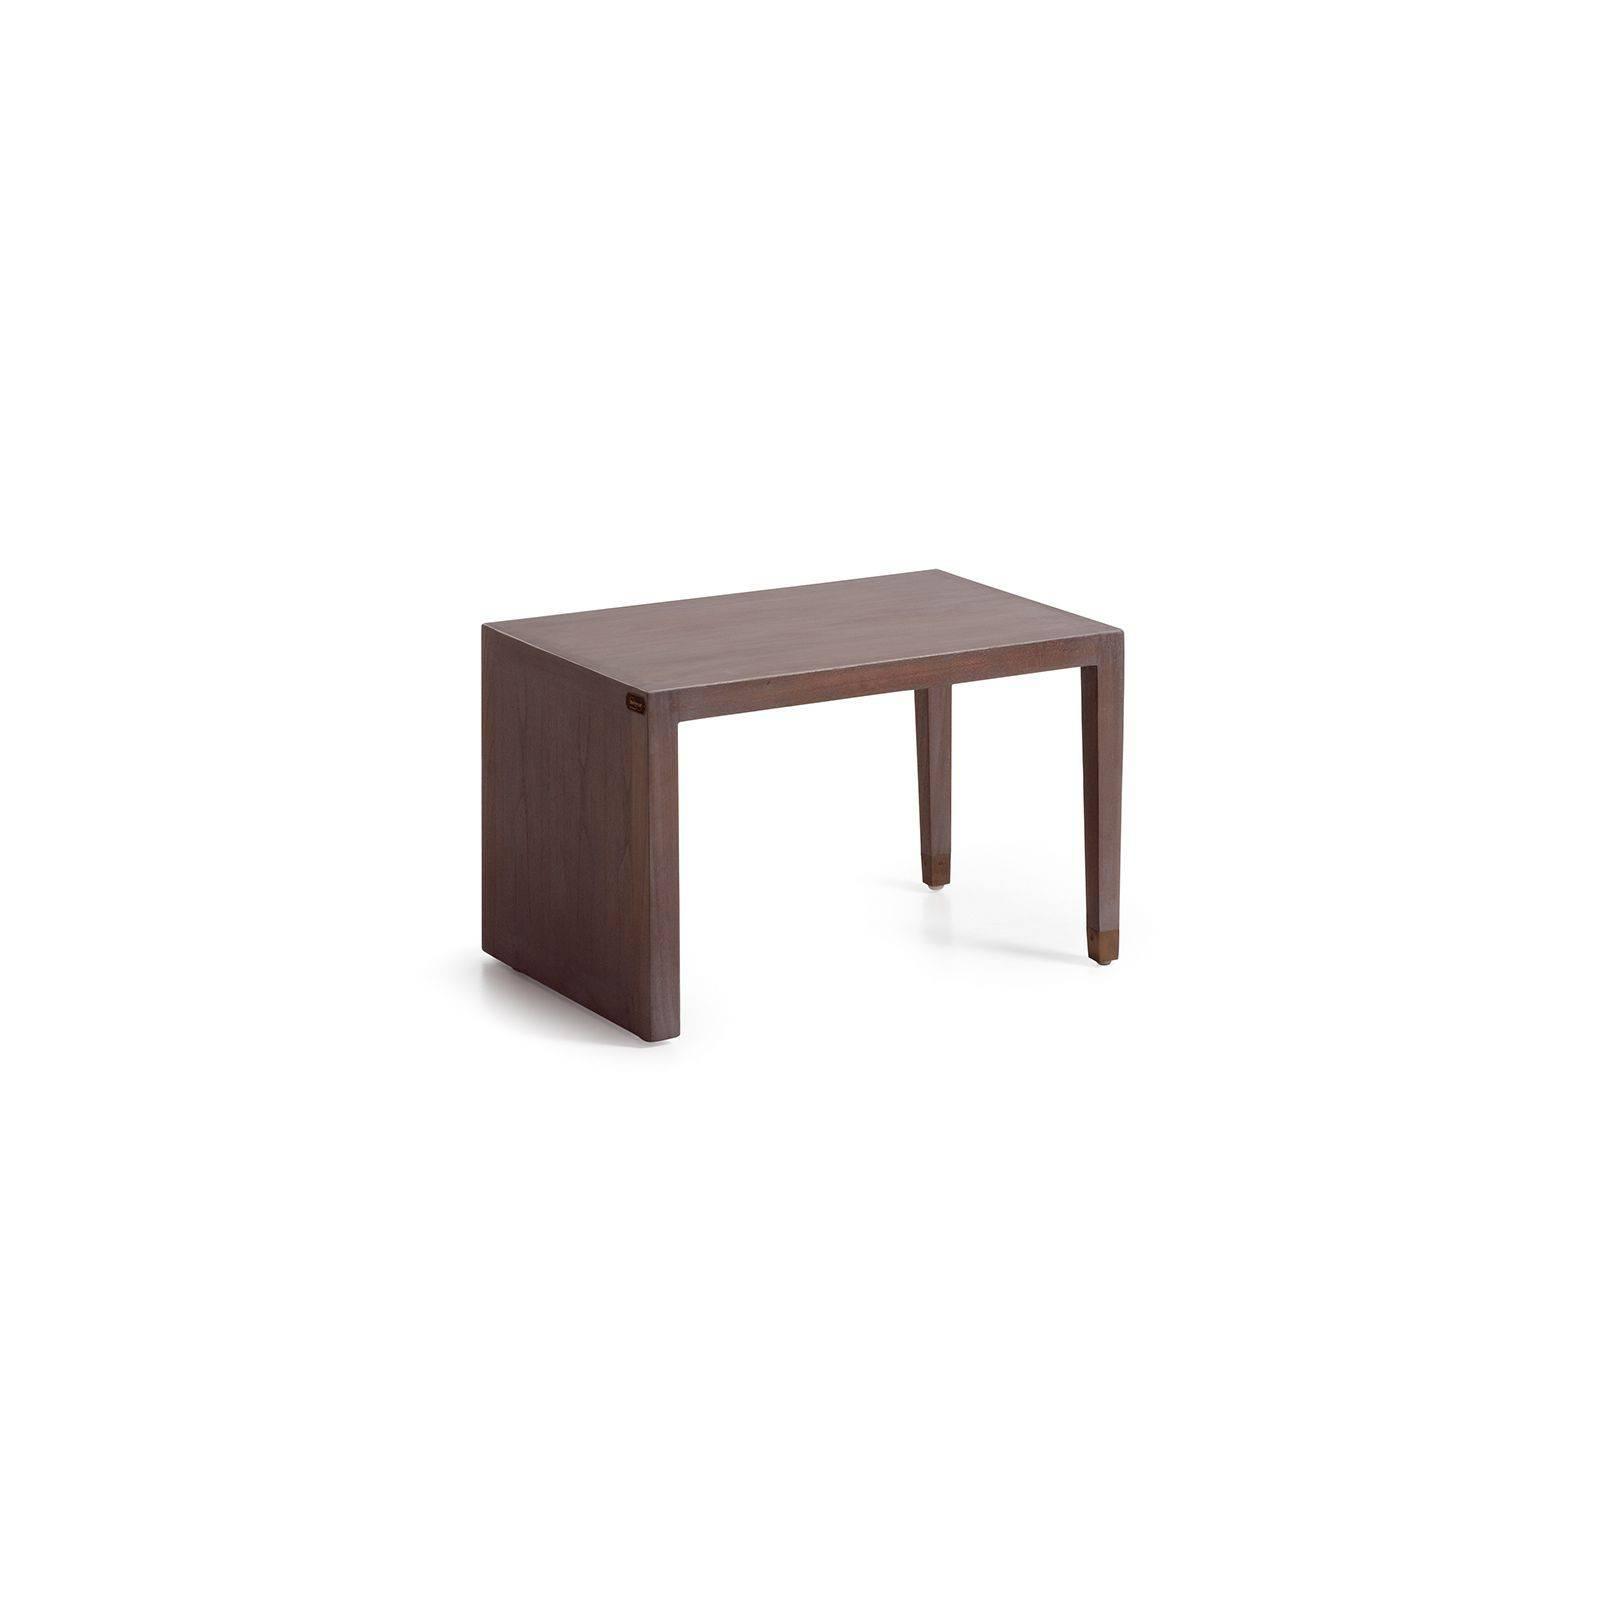 Table basse multifonction Vintage Mindi Massif - achat meuble vintage